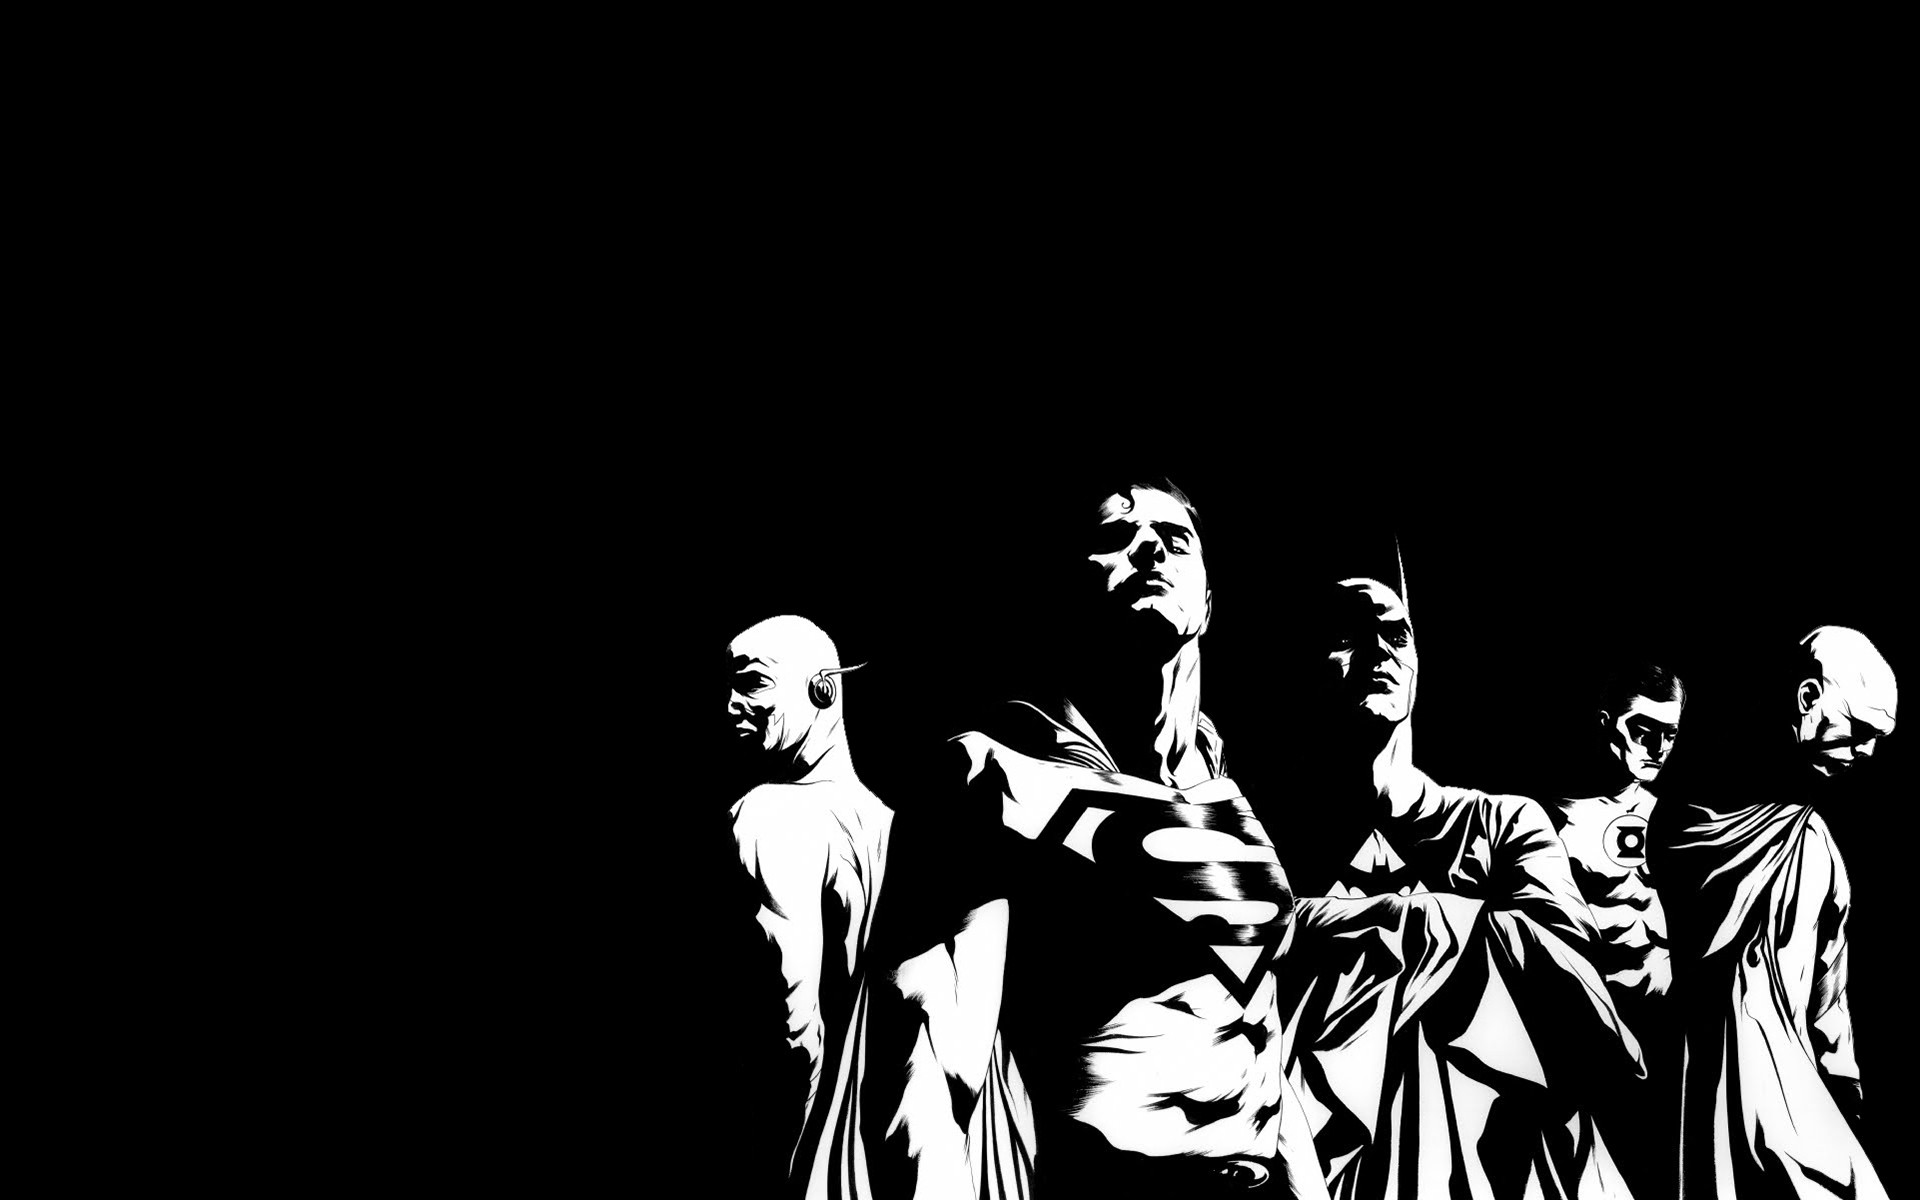 Justice League BW Black Superman Batman The Flash Green Lantern DC .